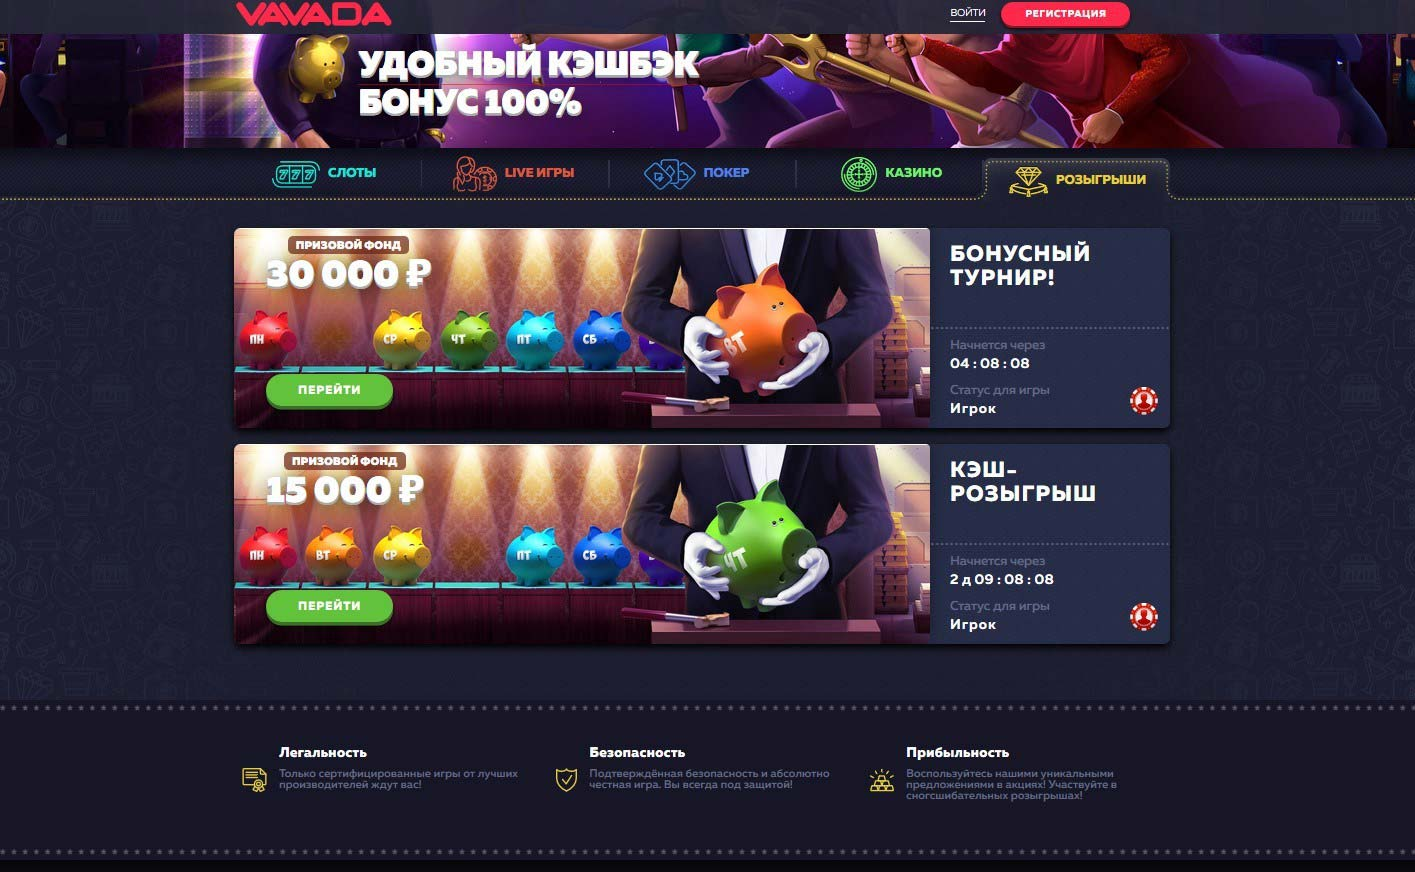 Промокод и код купона на скидку Babadu.ru август и сентябрь 2019